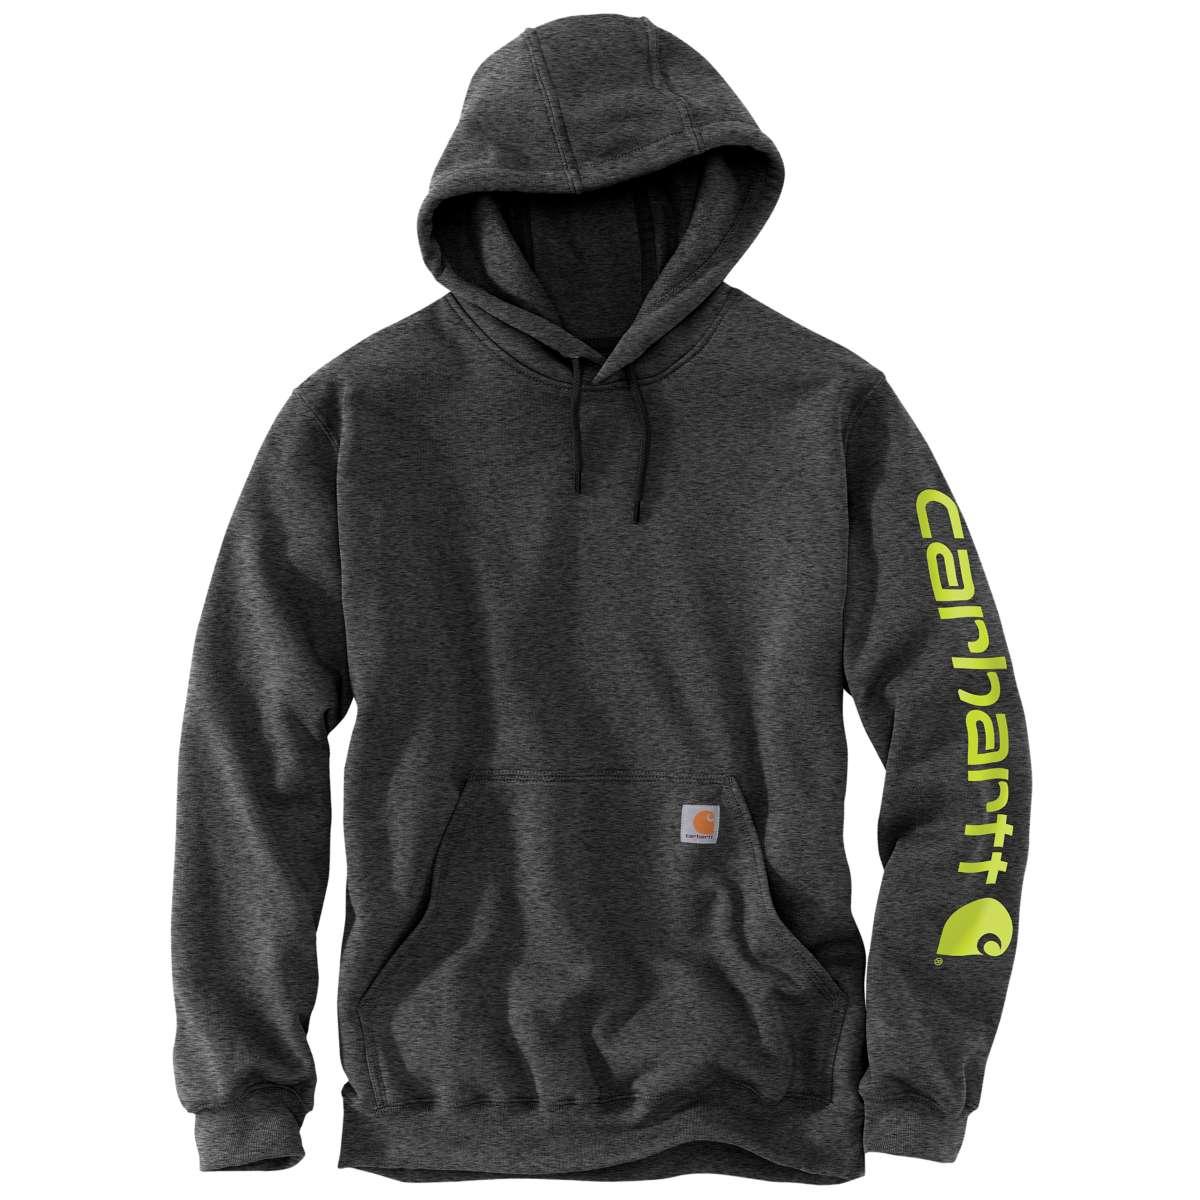 Carhartt Men's Midweight Hooded Logo Sweatshirt - Black, XXL